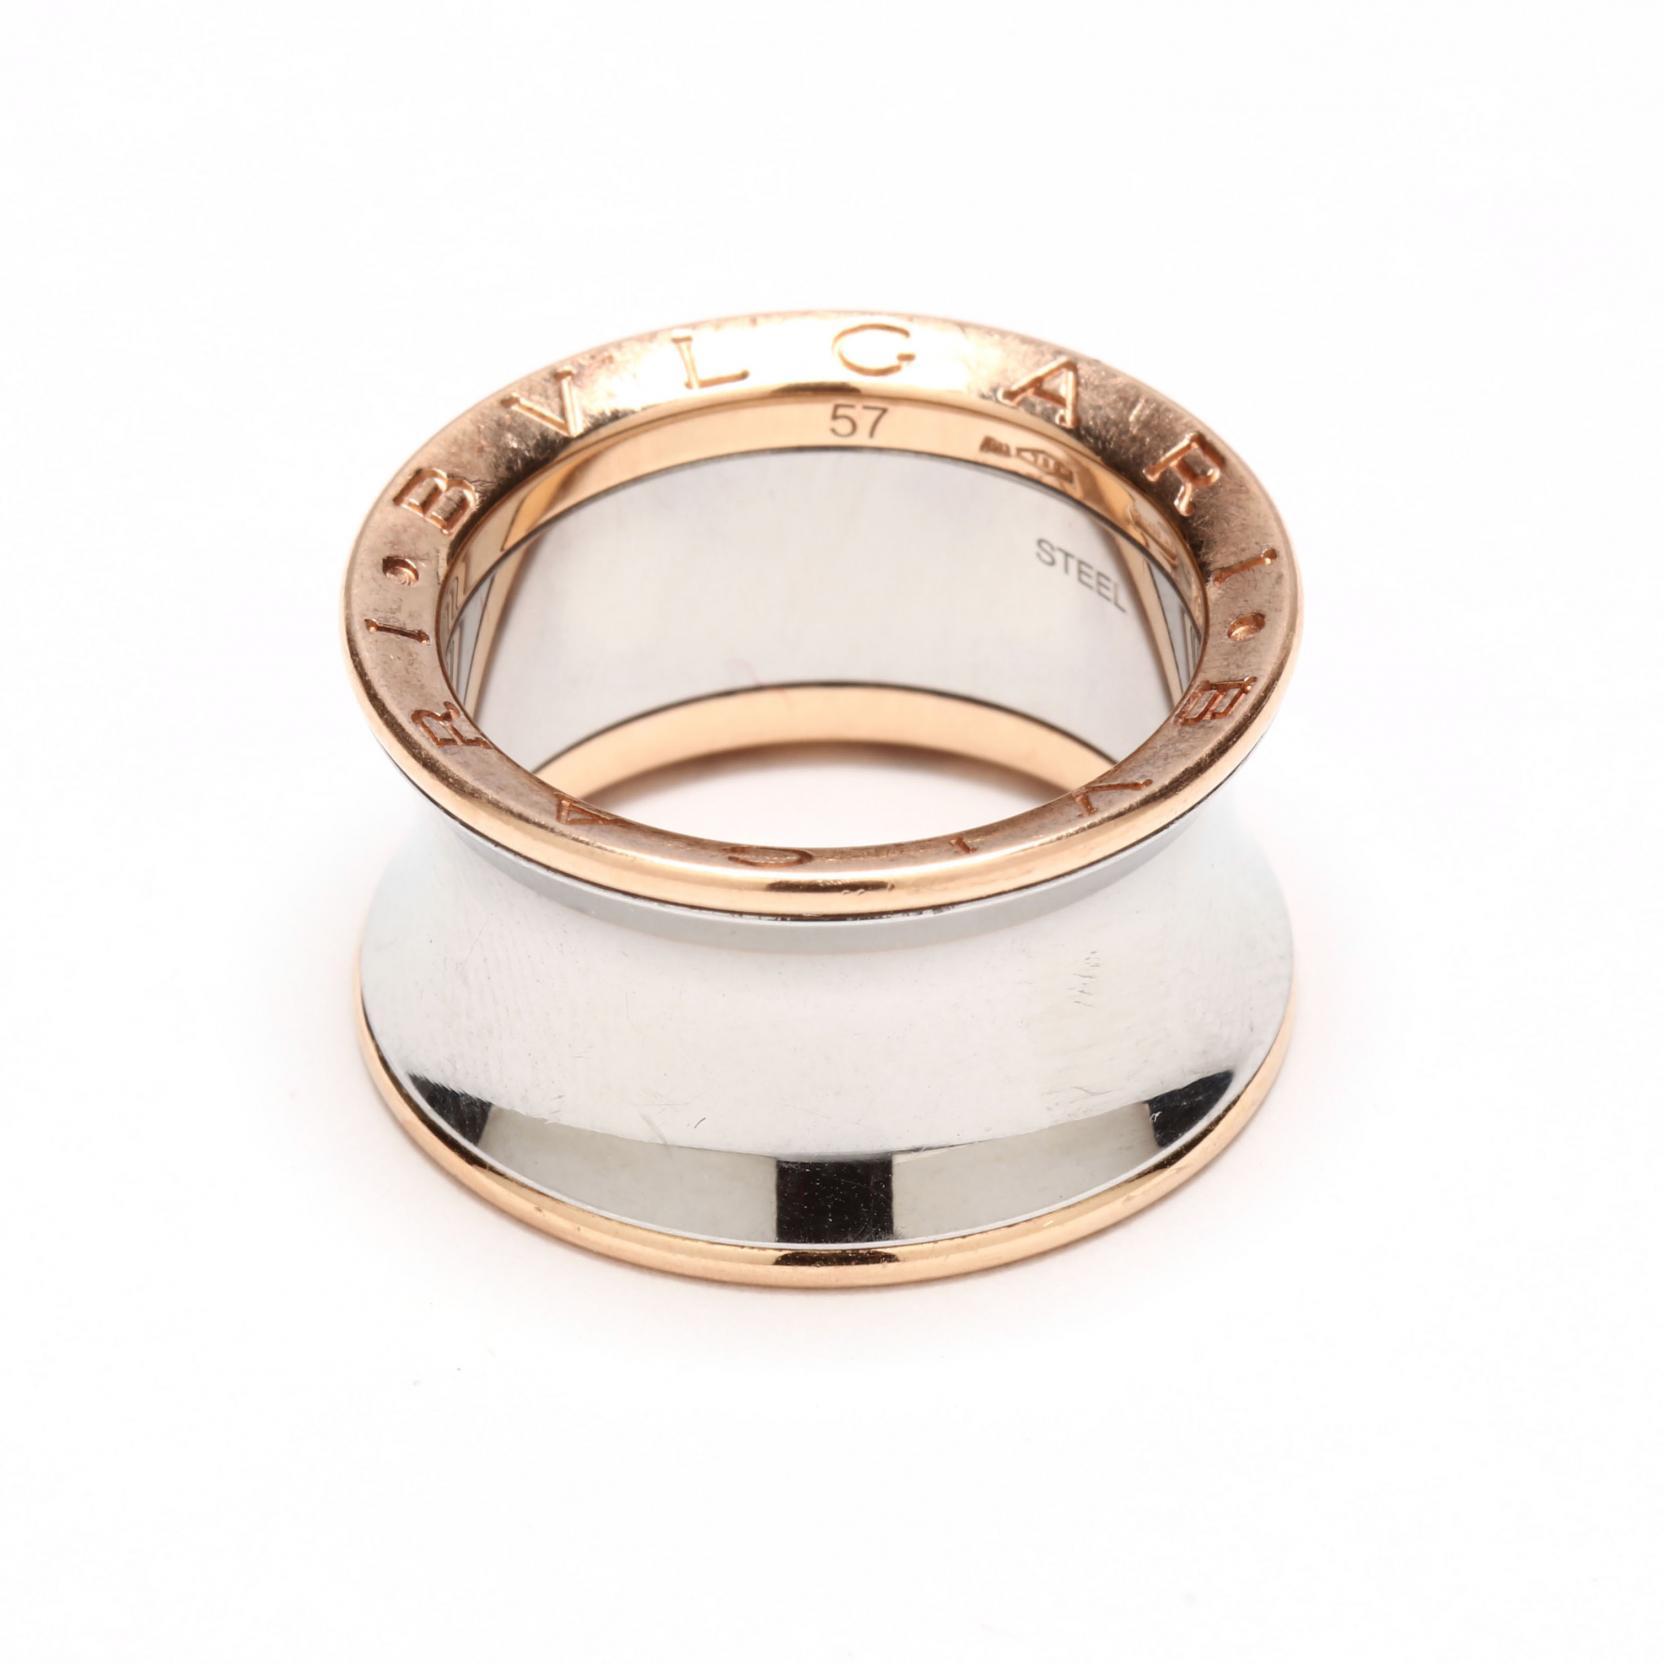 18kt-rose-gold-and-steel-ring-bulgari